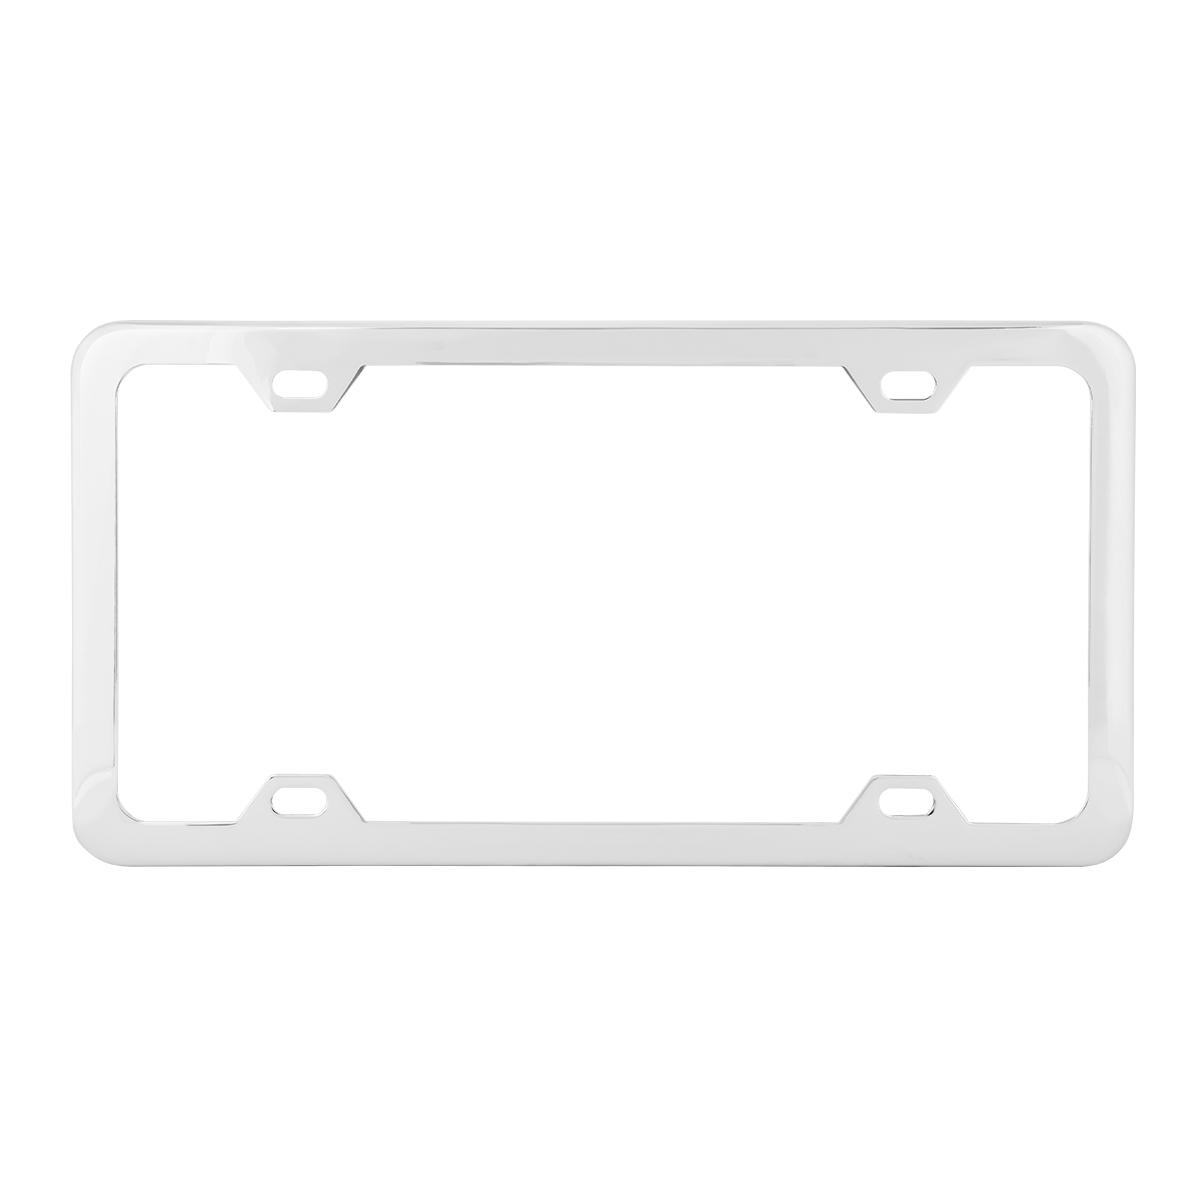 60412 Plain Chrome Plated 4 Hole License Plate Frame